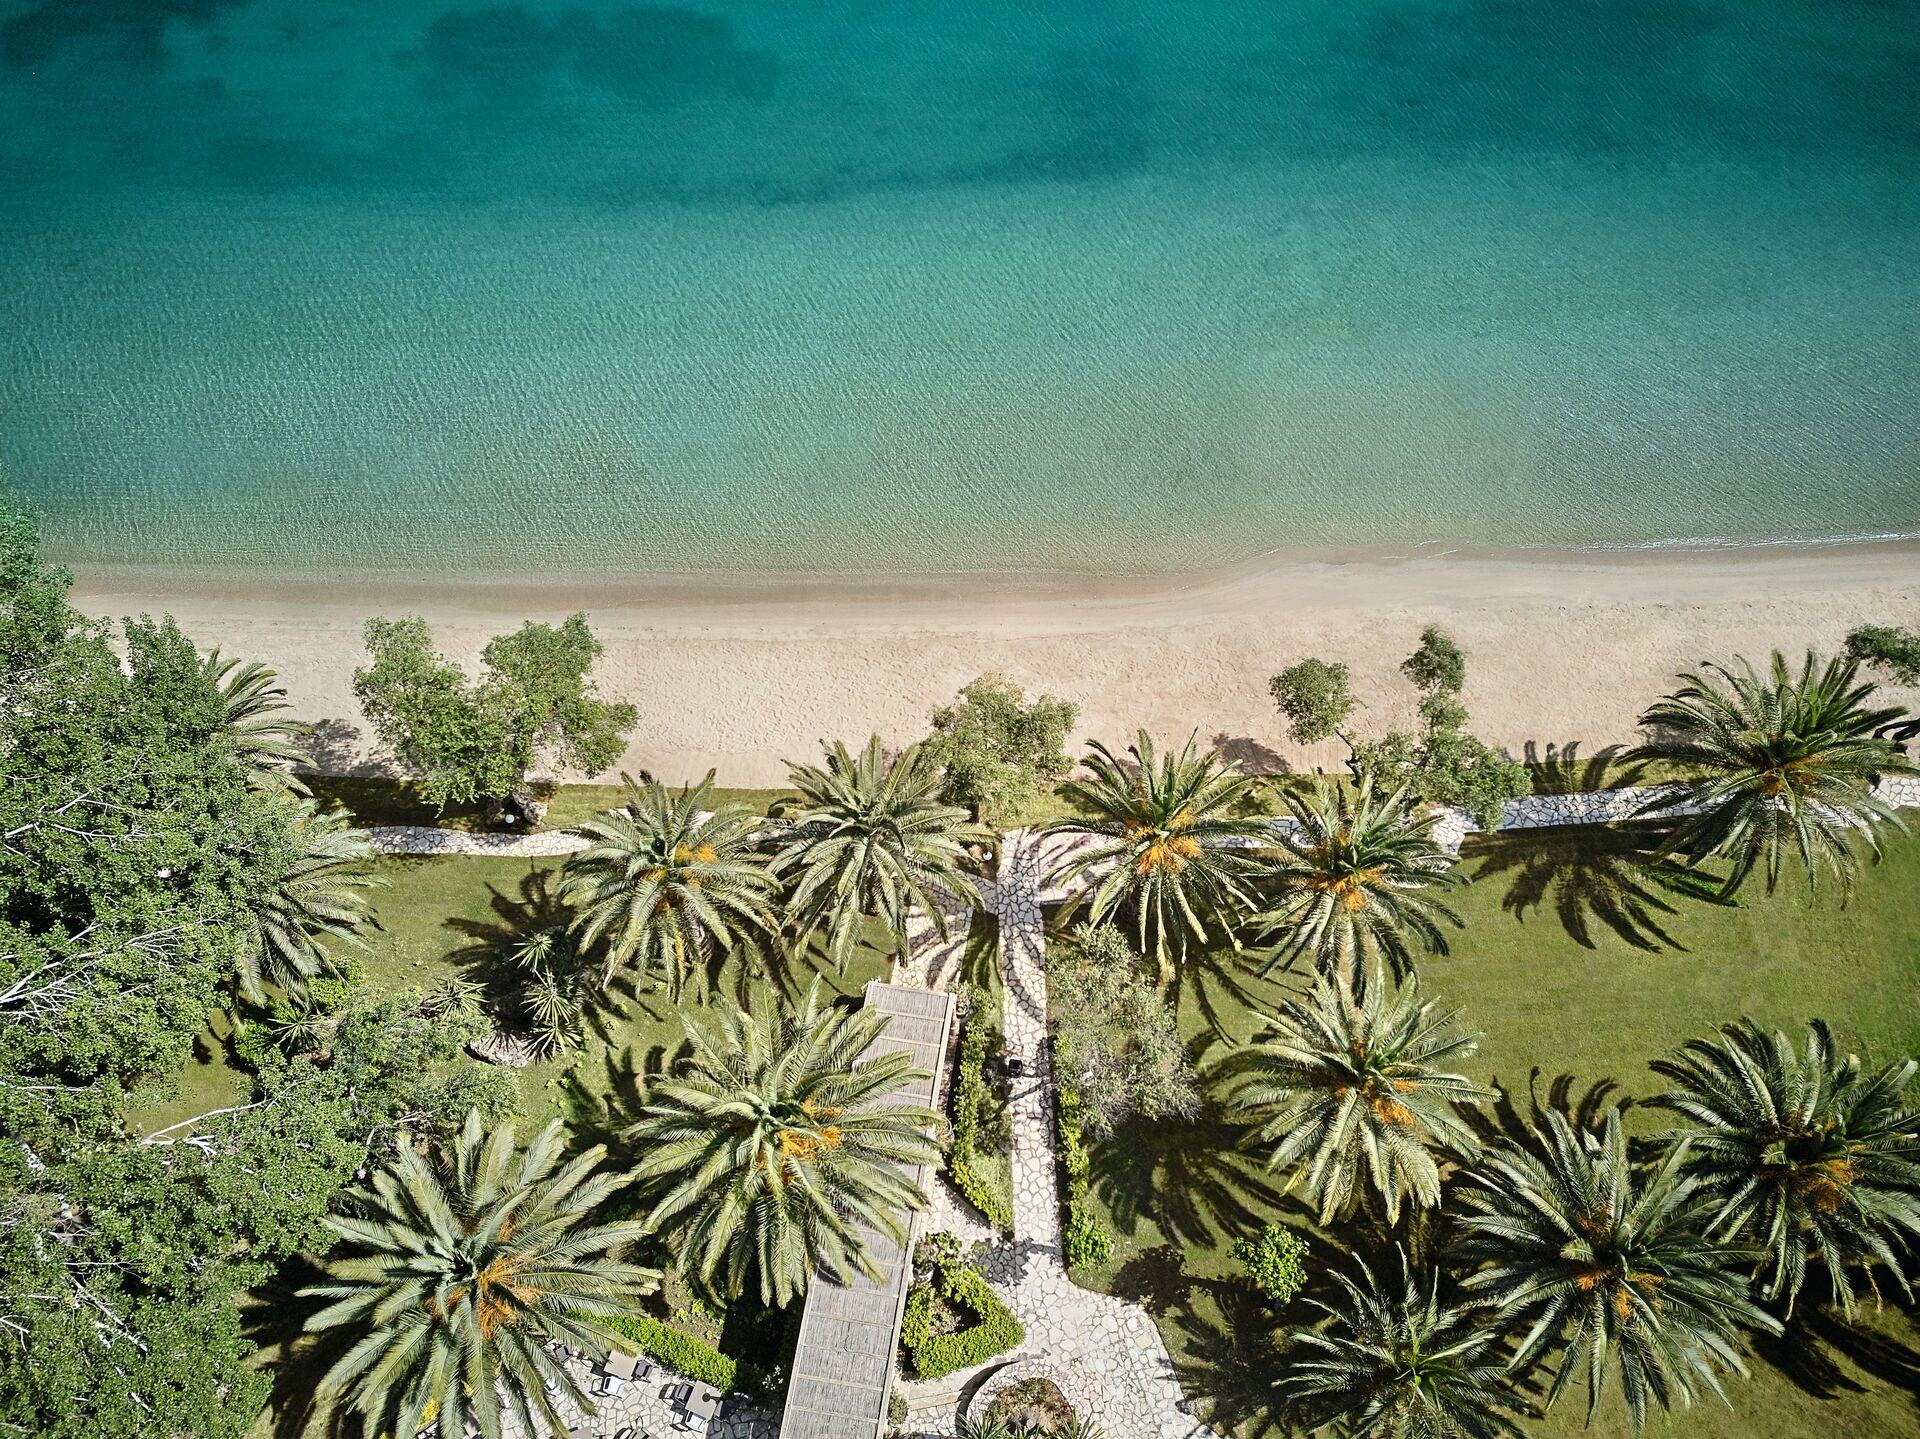 https://cms.satur.sk/data/imgs/tour_image/orig/01-cobblestone-path-leading-to-the-lux-me-daphnila-bay-beach_72dpi-1924845.jpg